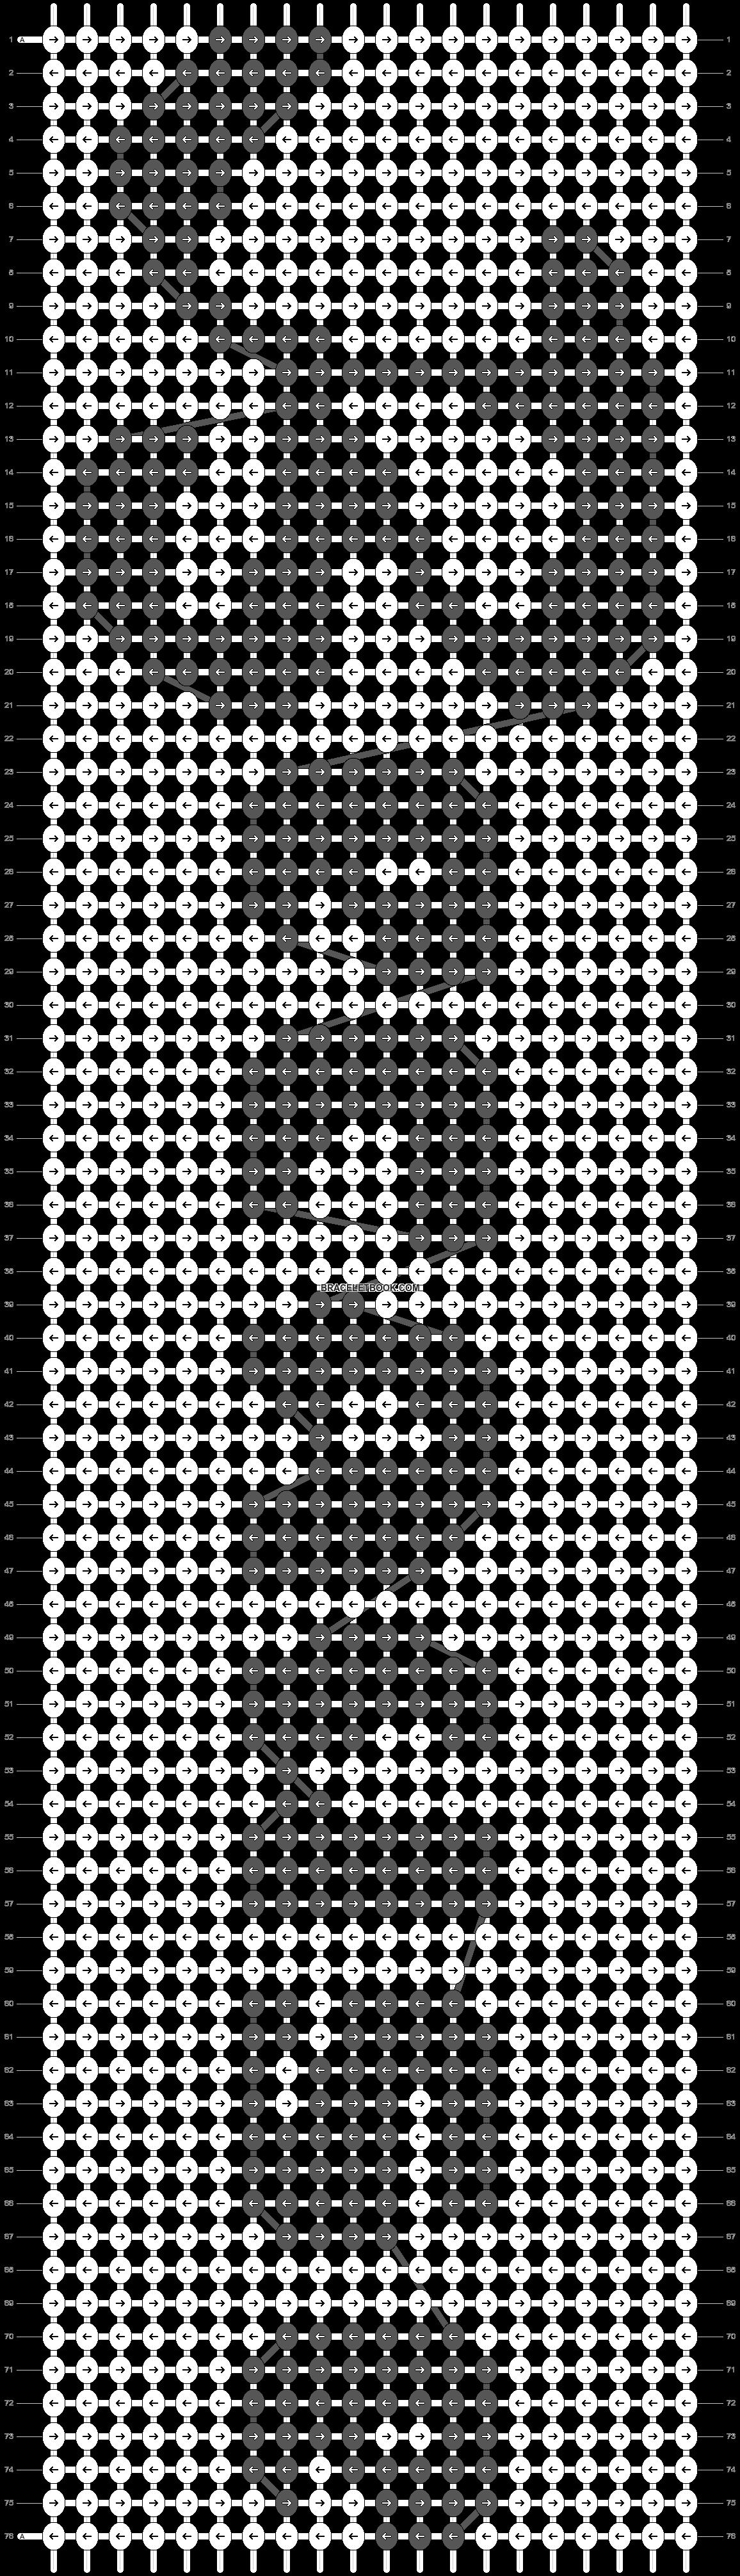 Alpha Pattern #15133 added by always8